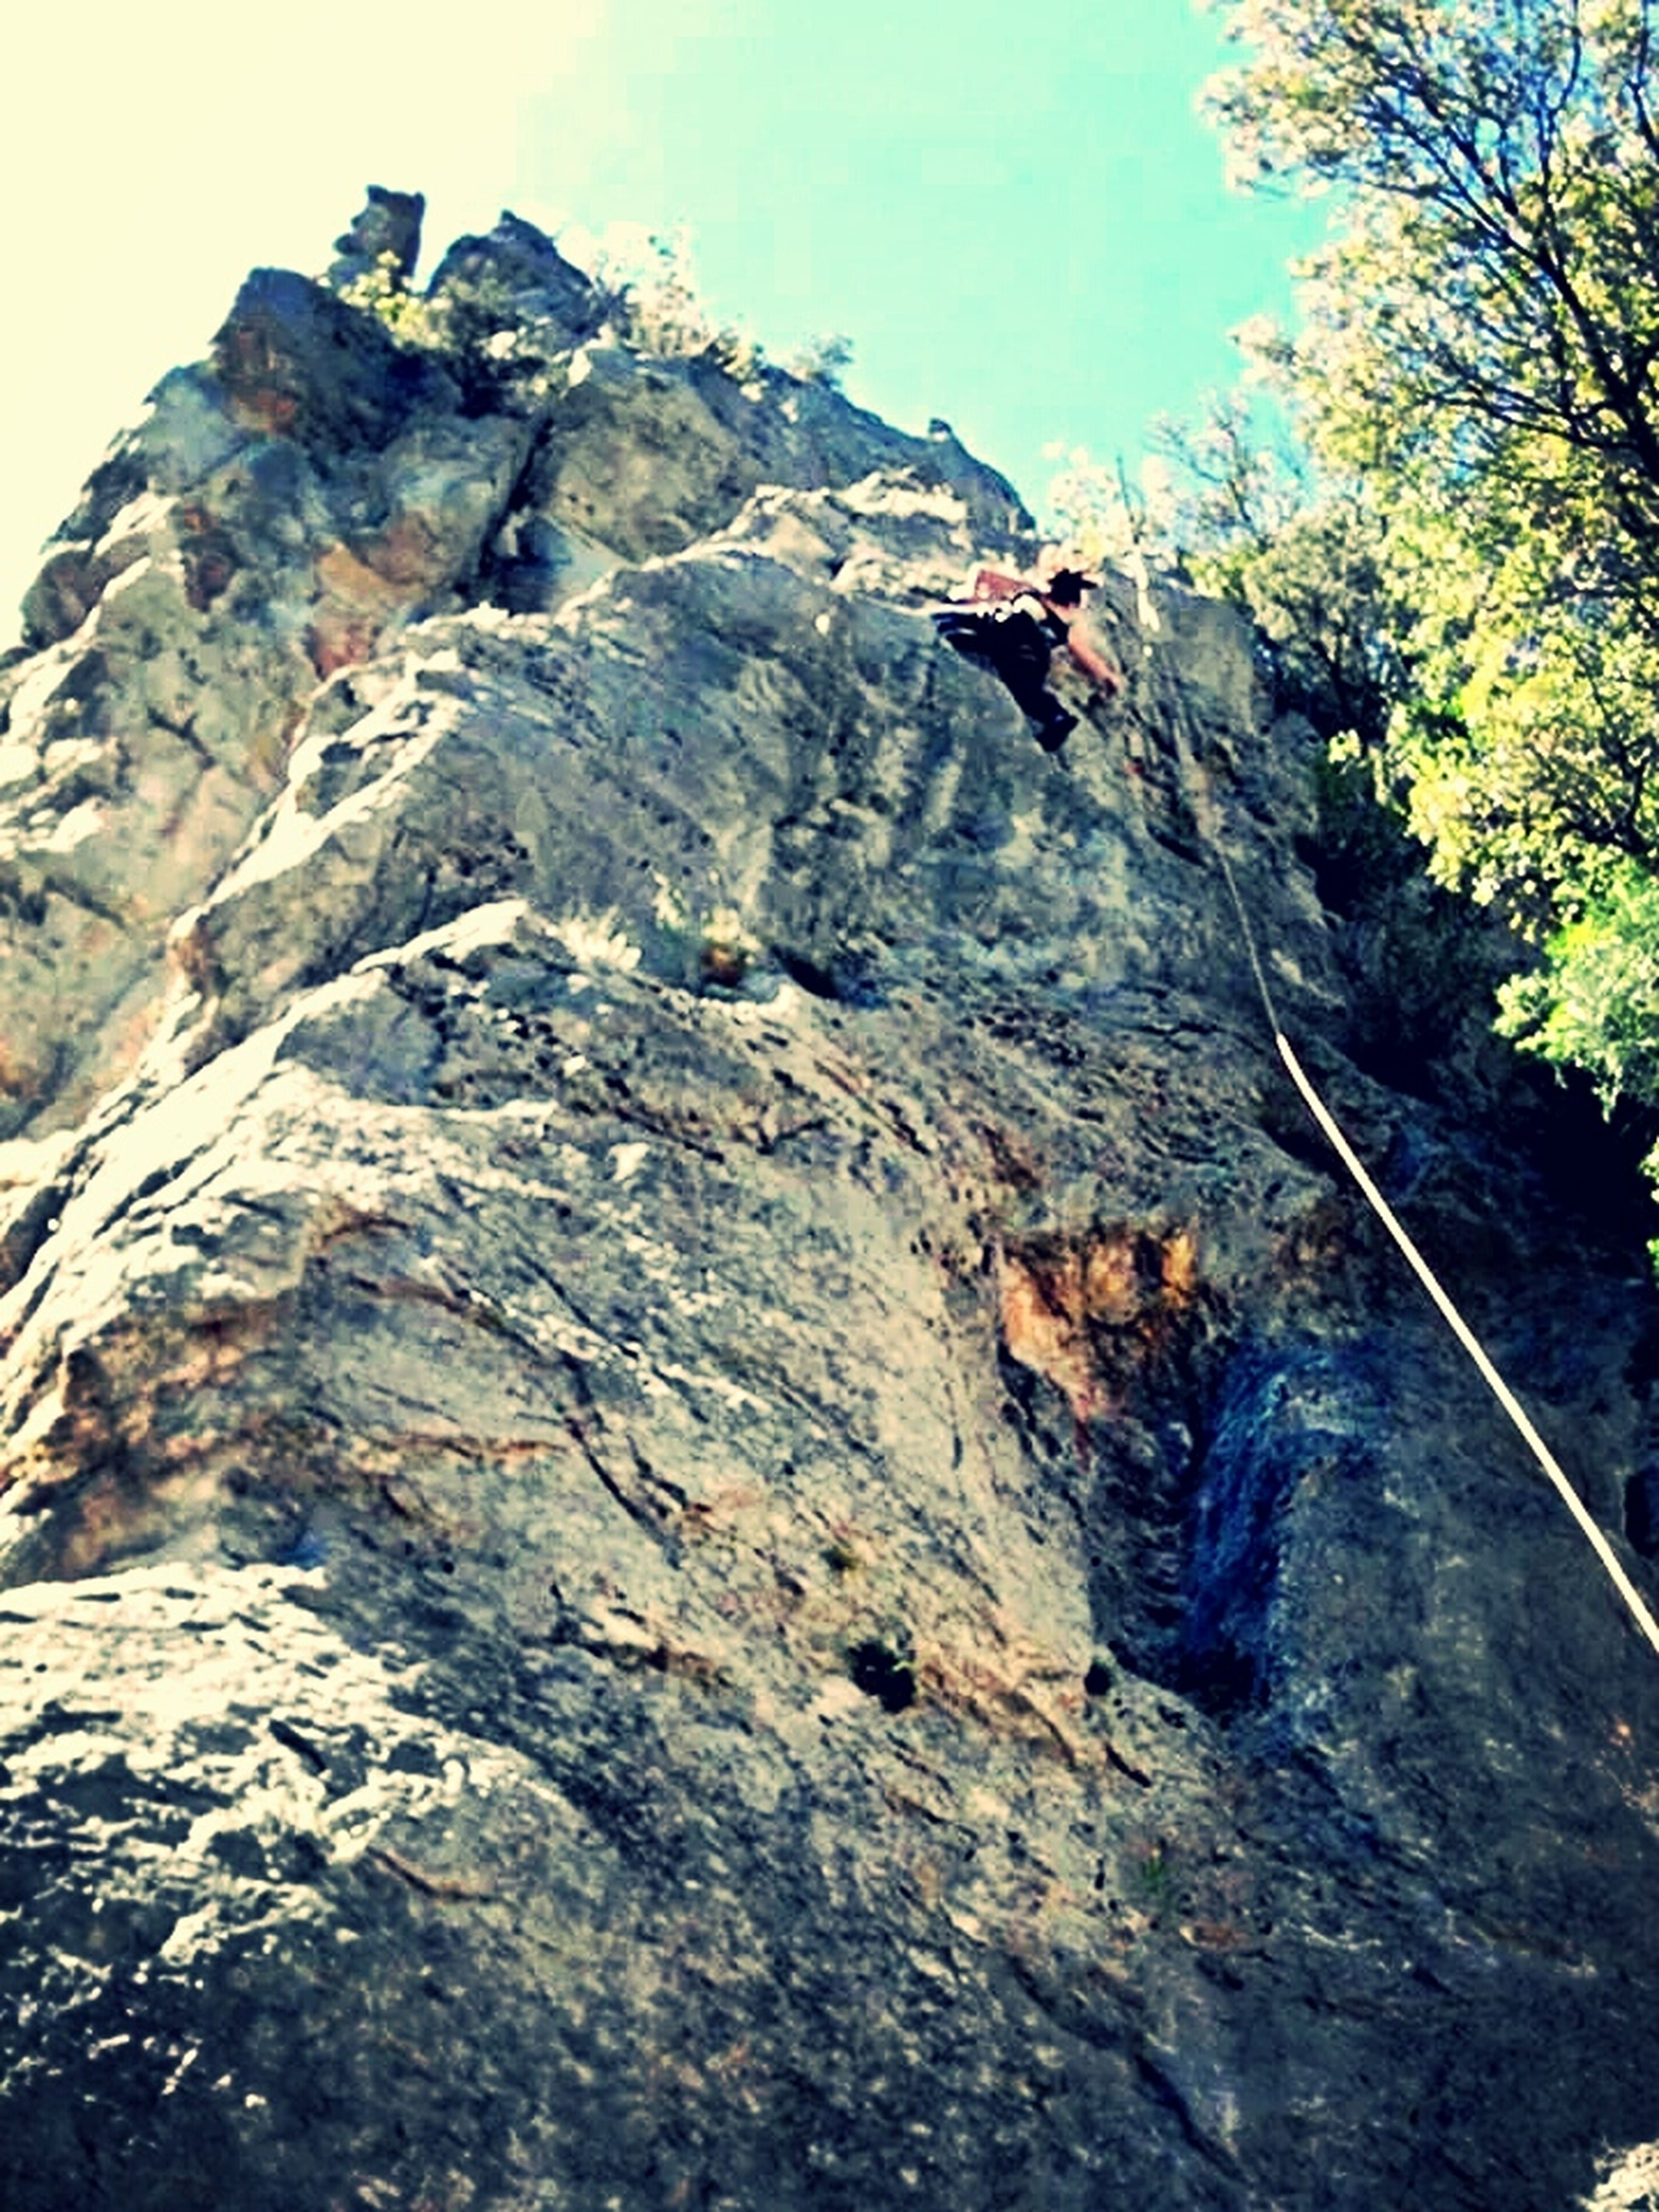 Climbing, Love My Sport❤ Enjoying Nature